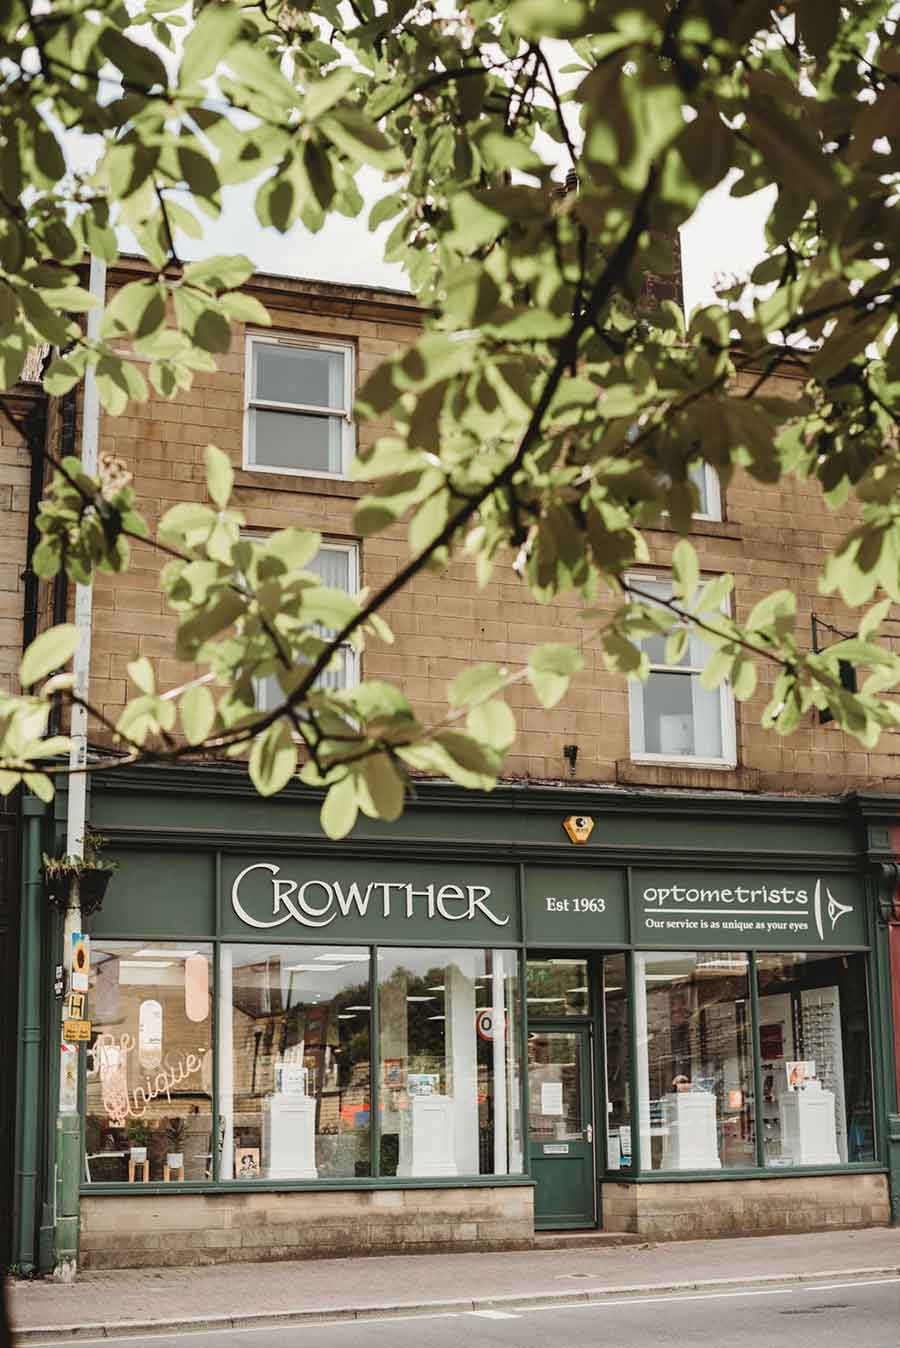 Crowther Optometrists